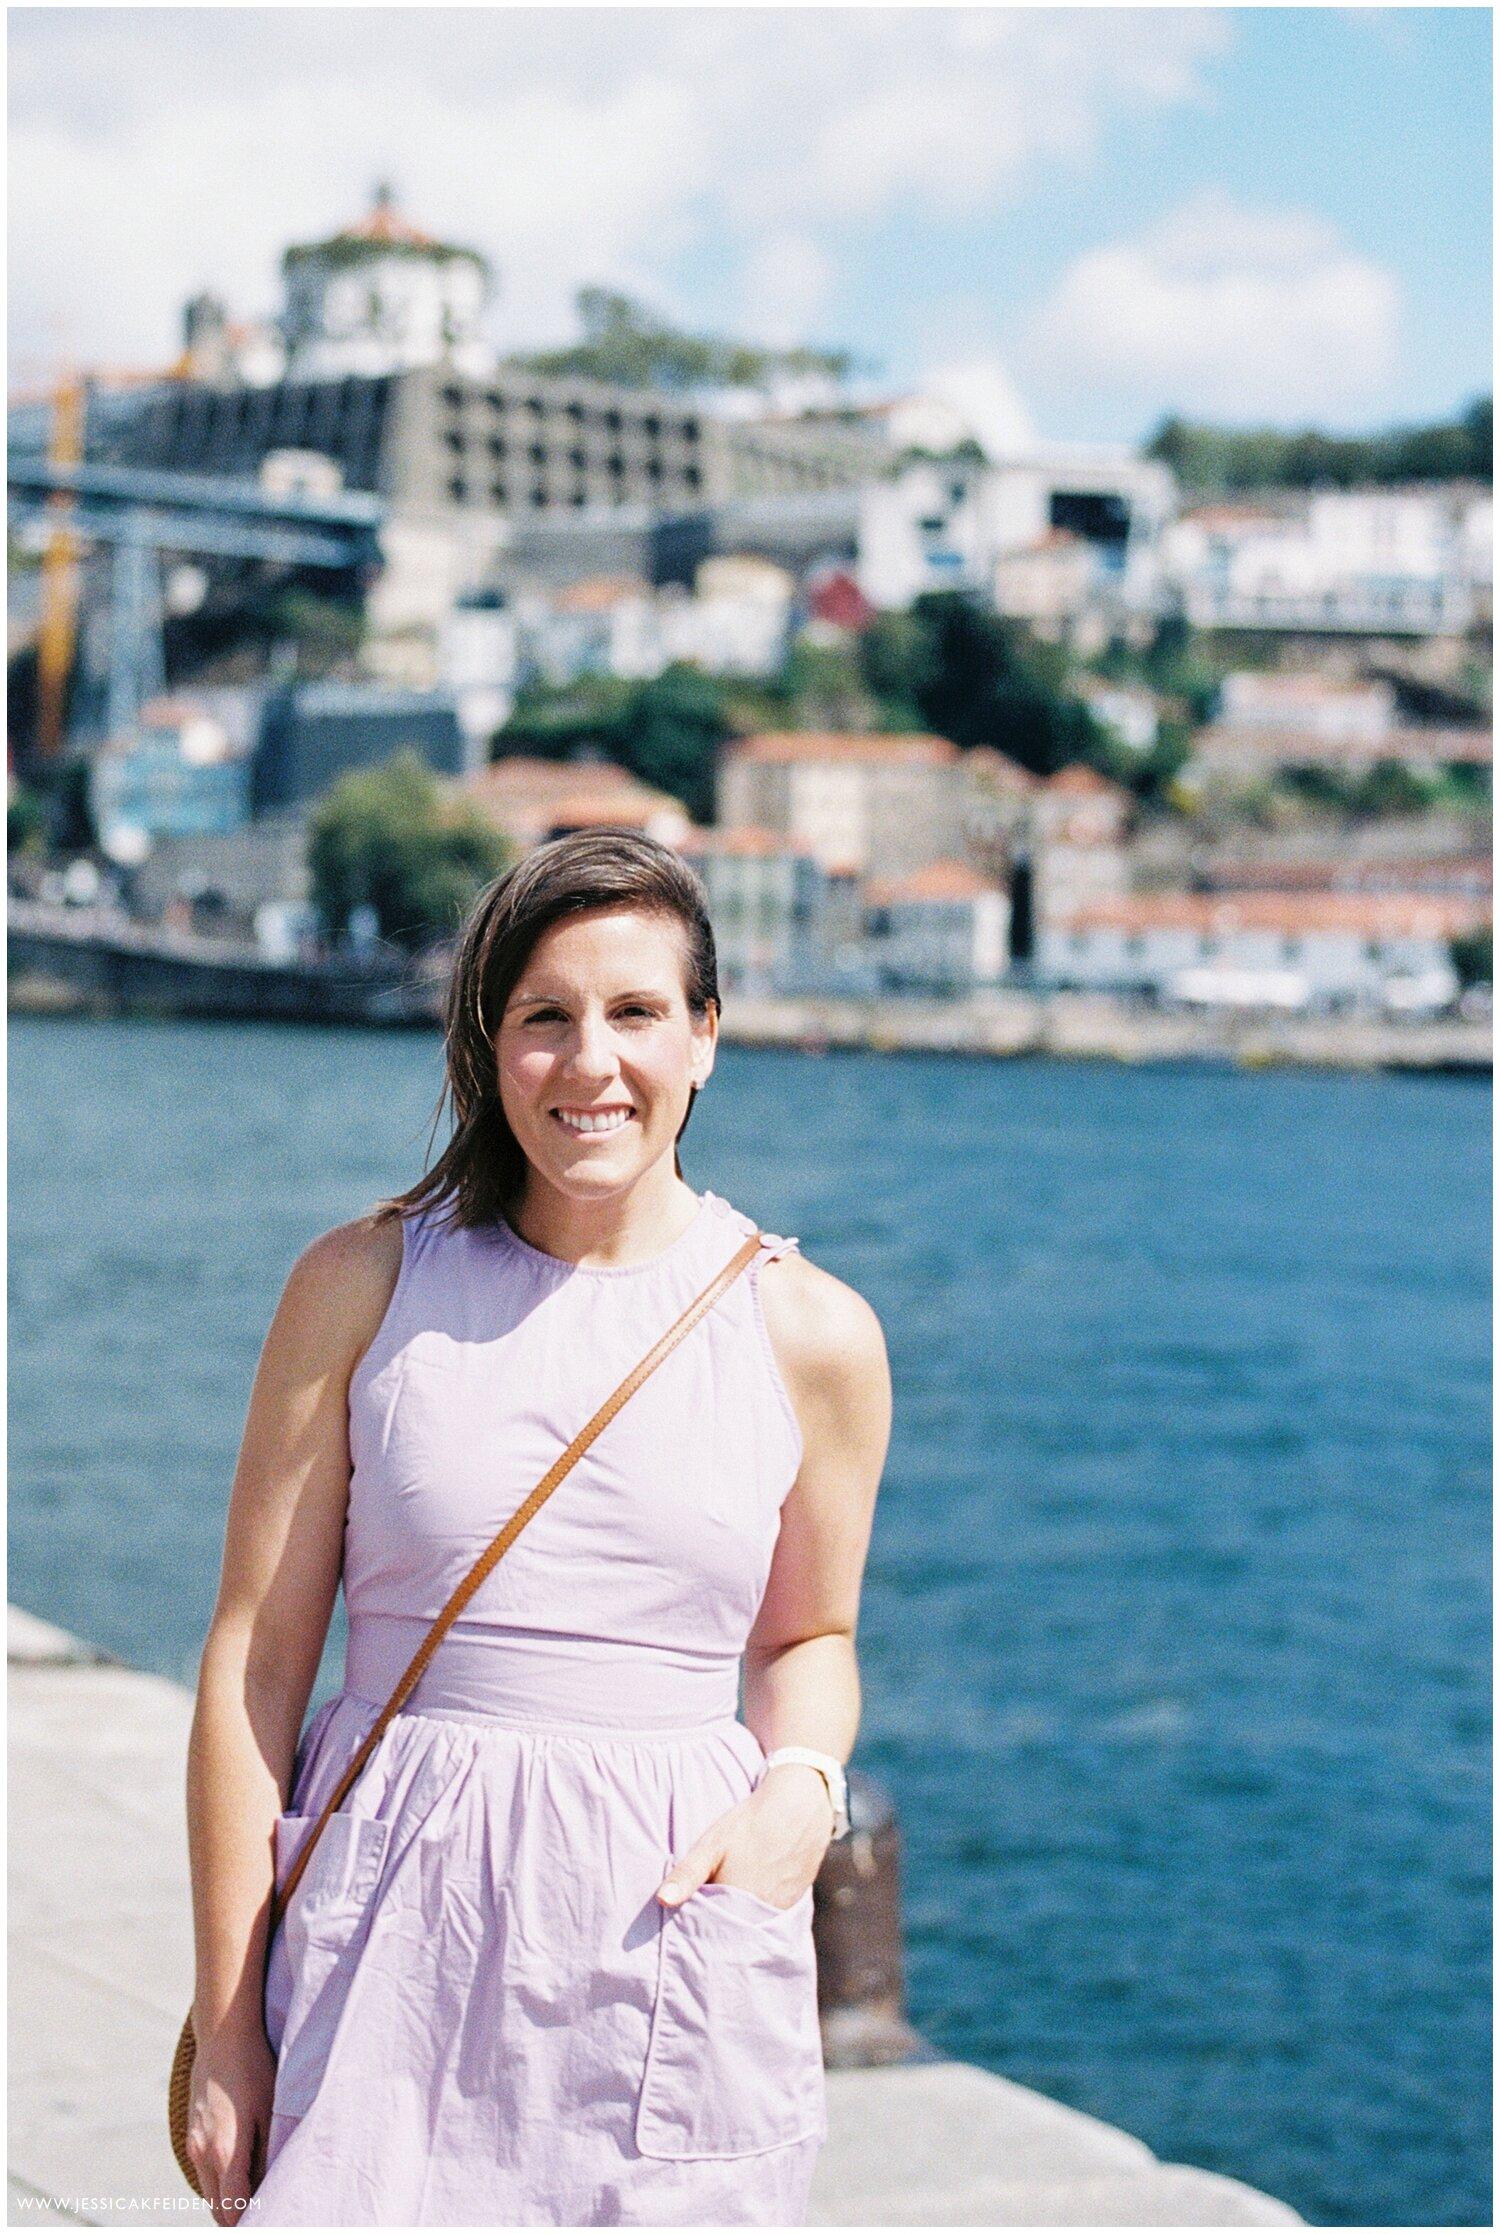 Jessica K Feiden Photography_Portugal Film Photographer_Portugal Travel Photographs_0027.jpg